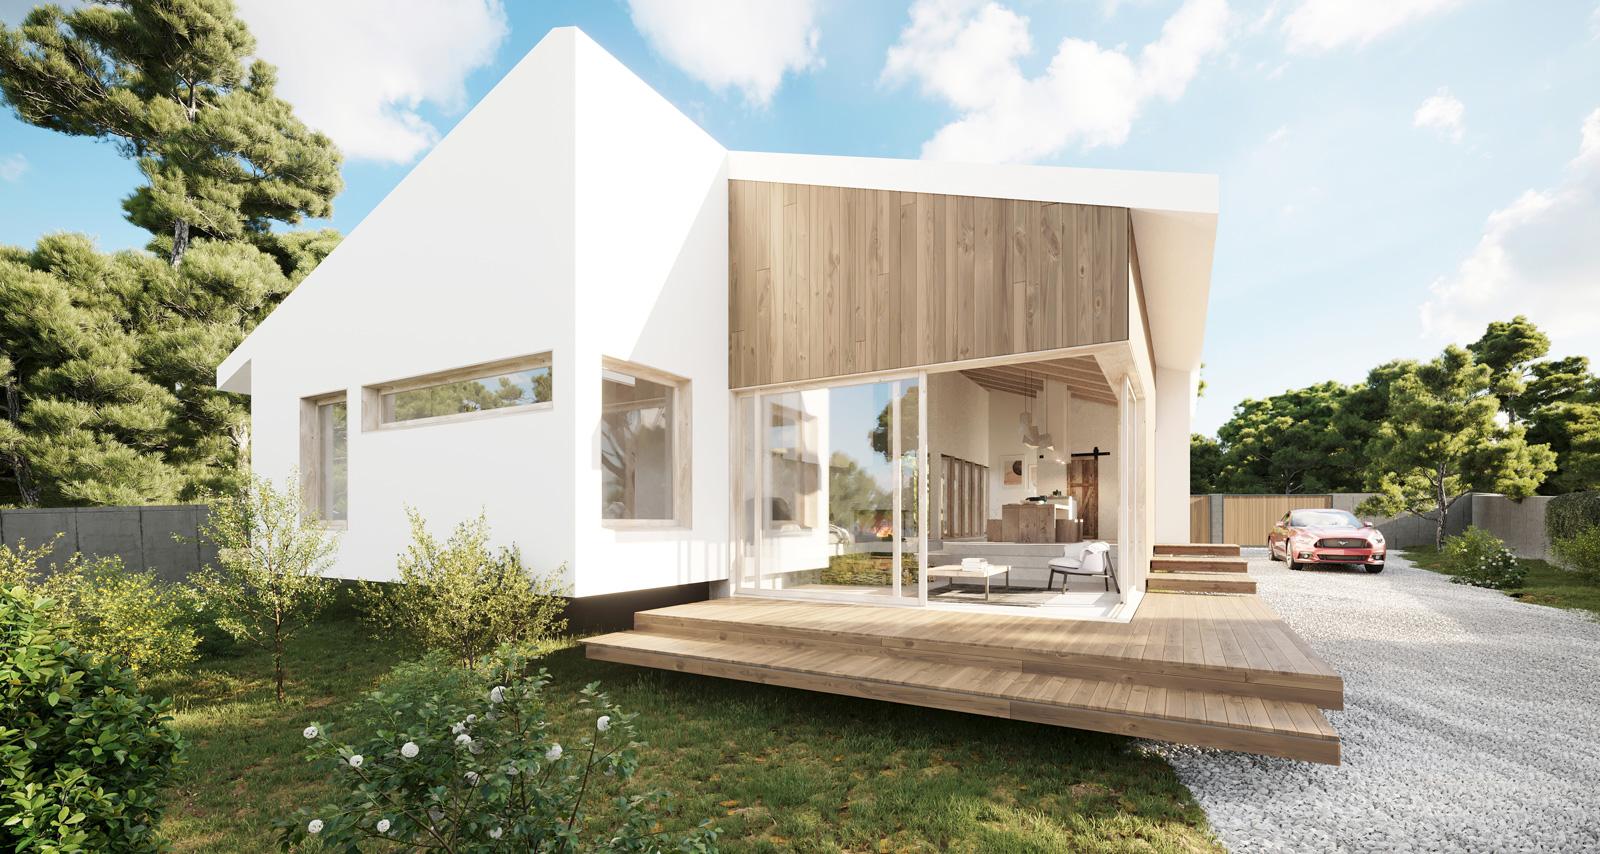 estudio de arquitectura en pravia